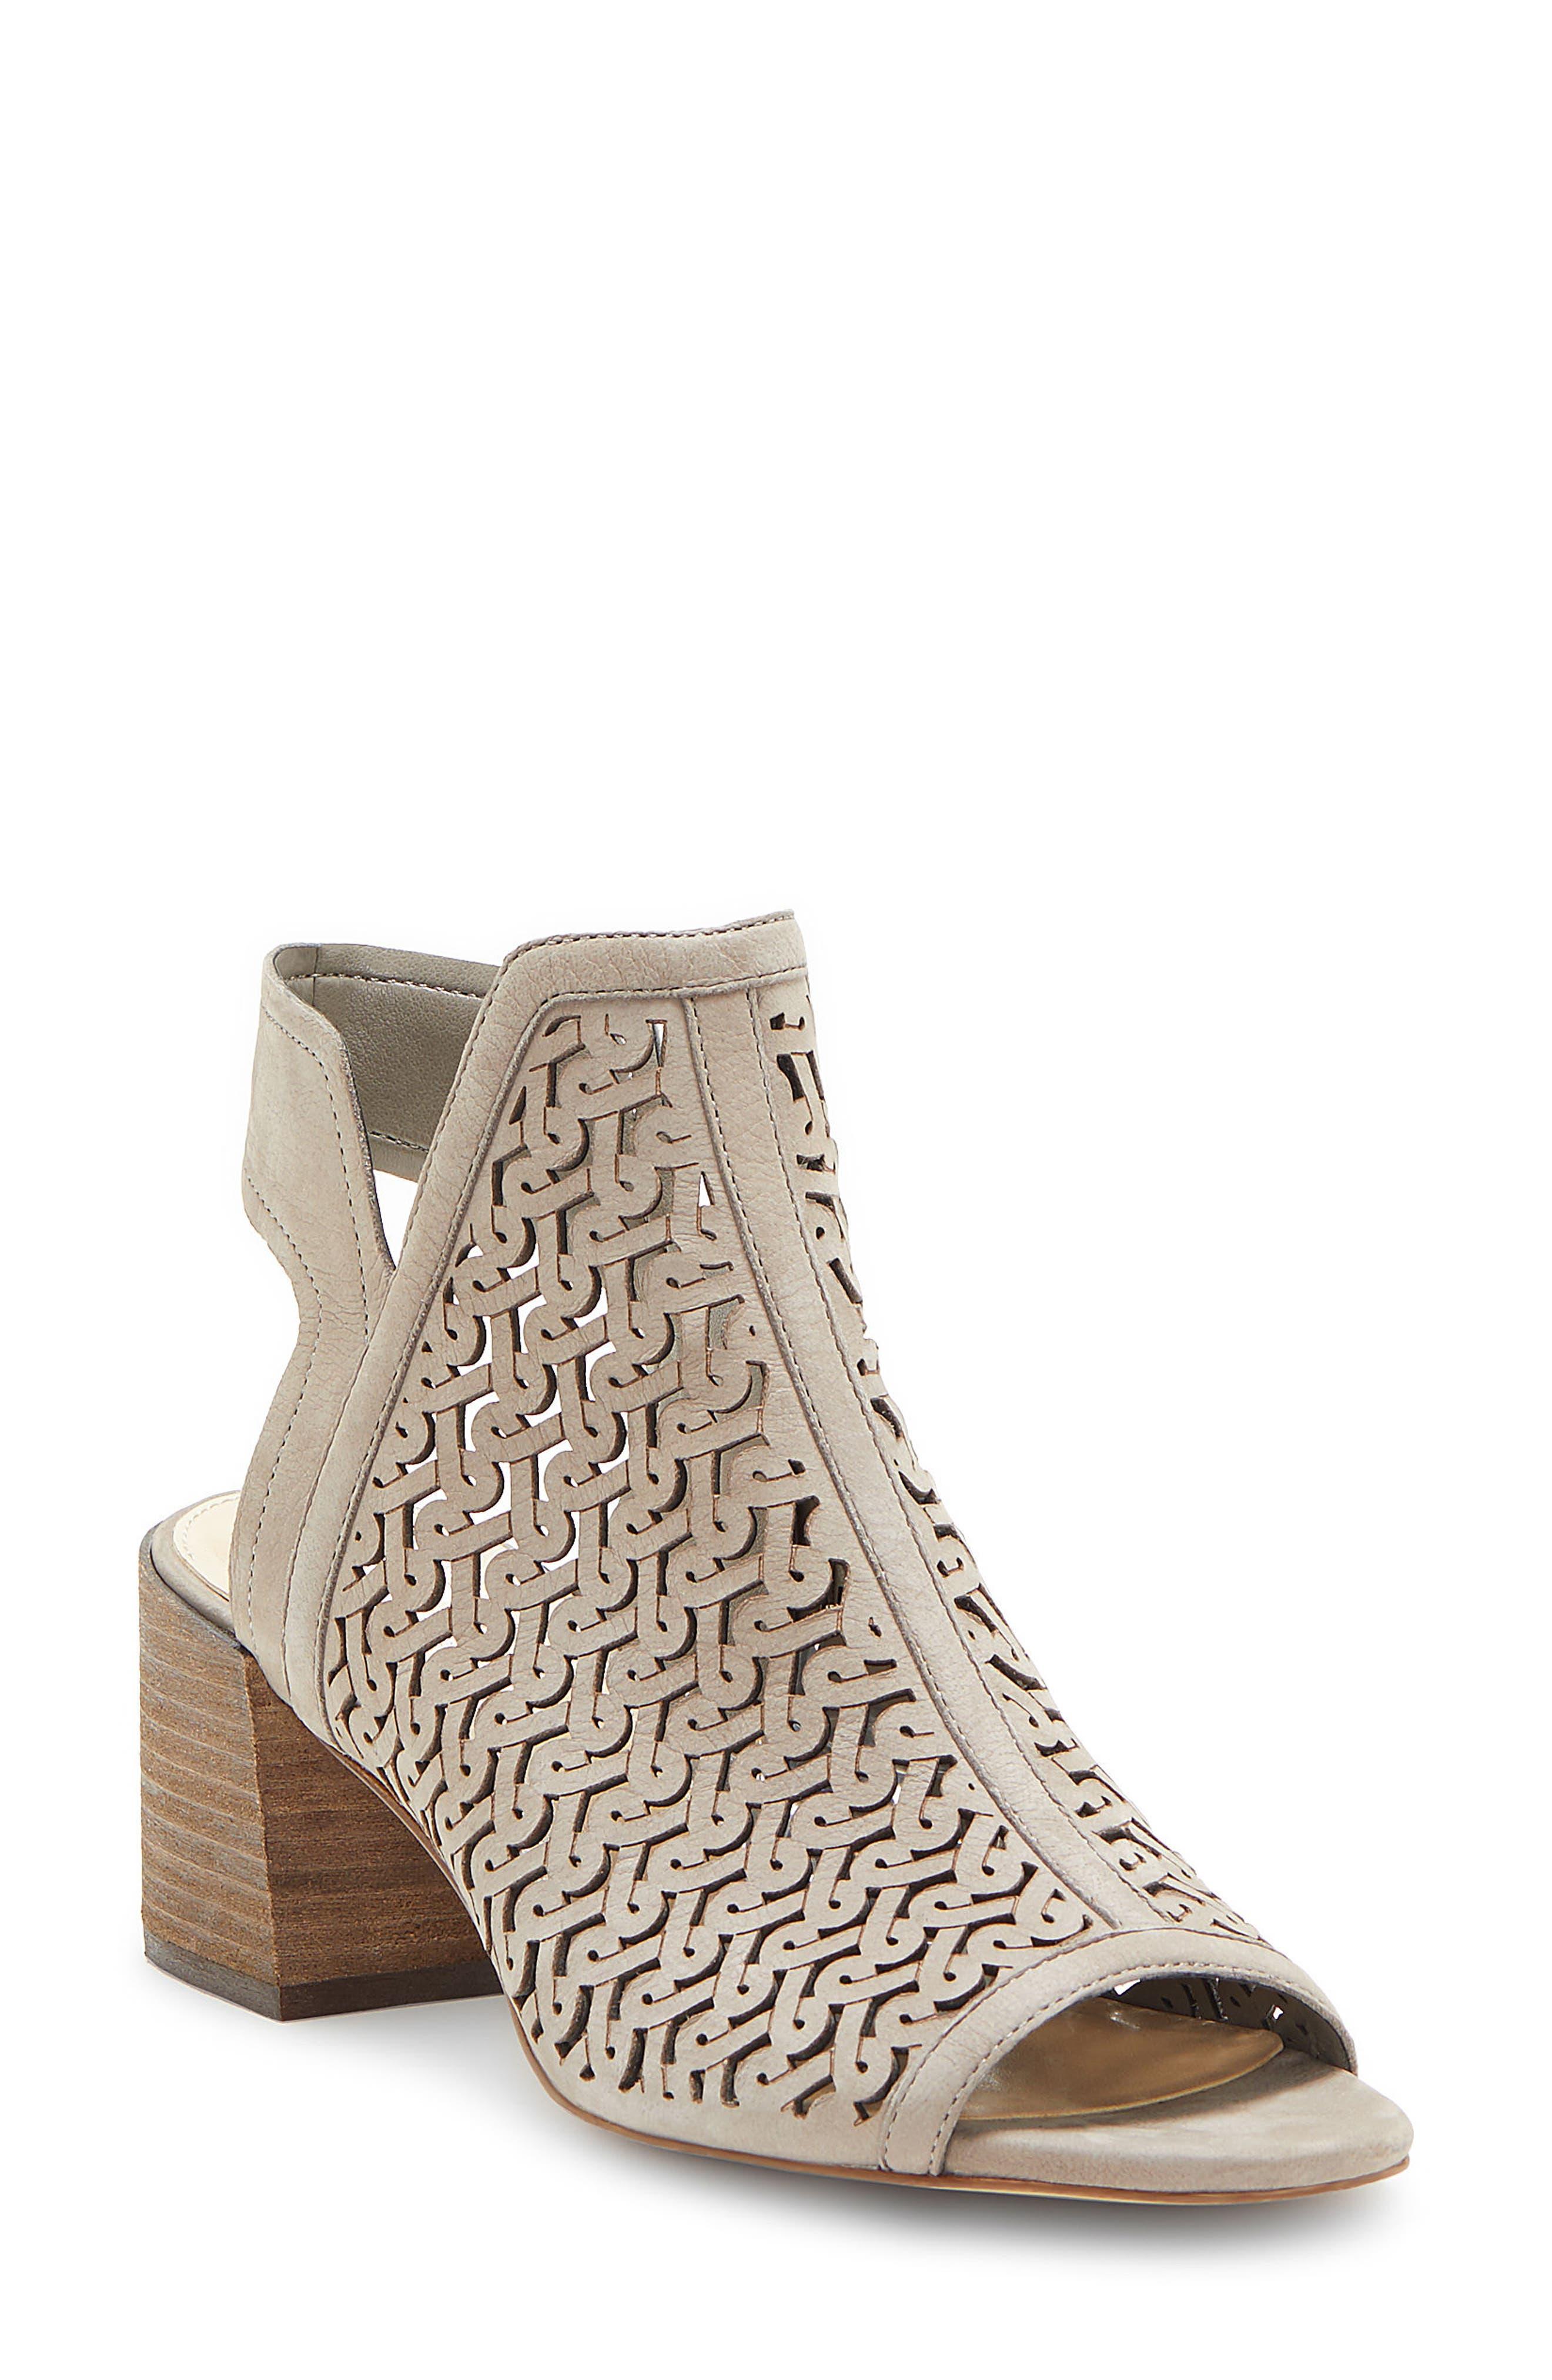 Sternat Sandal,                         Main,                         color, HIPPO GREY LEATHER